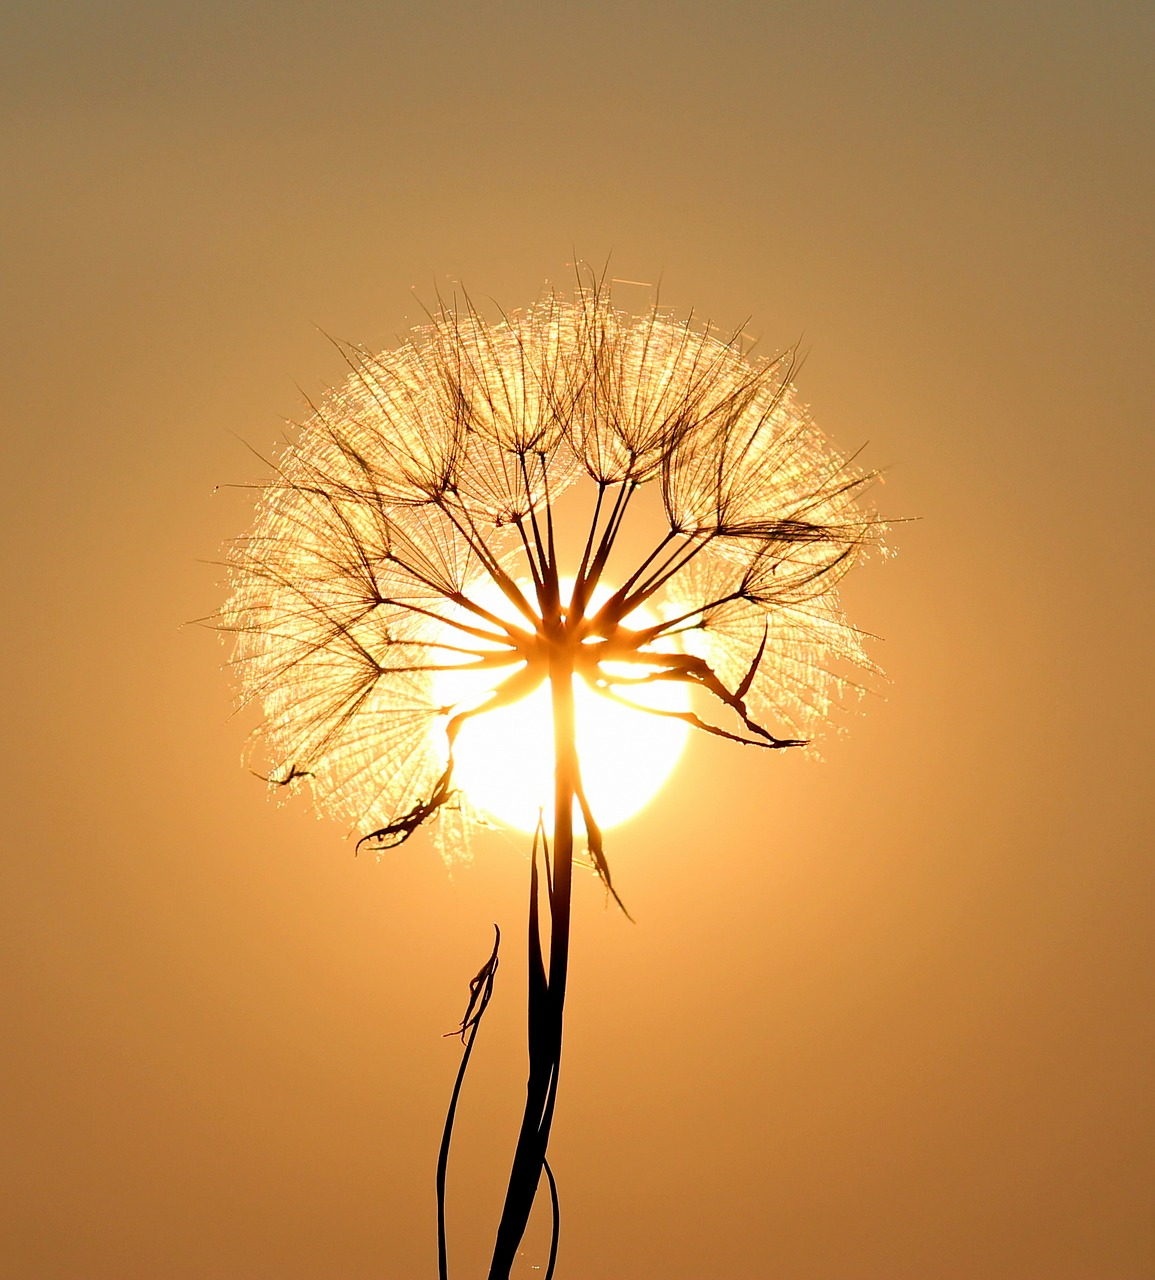 dandelion-1557110_1280.jpg